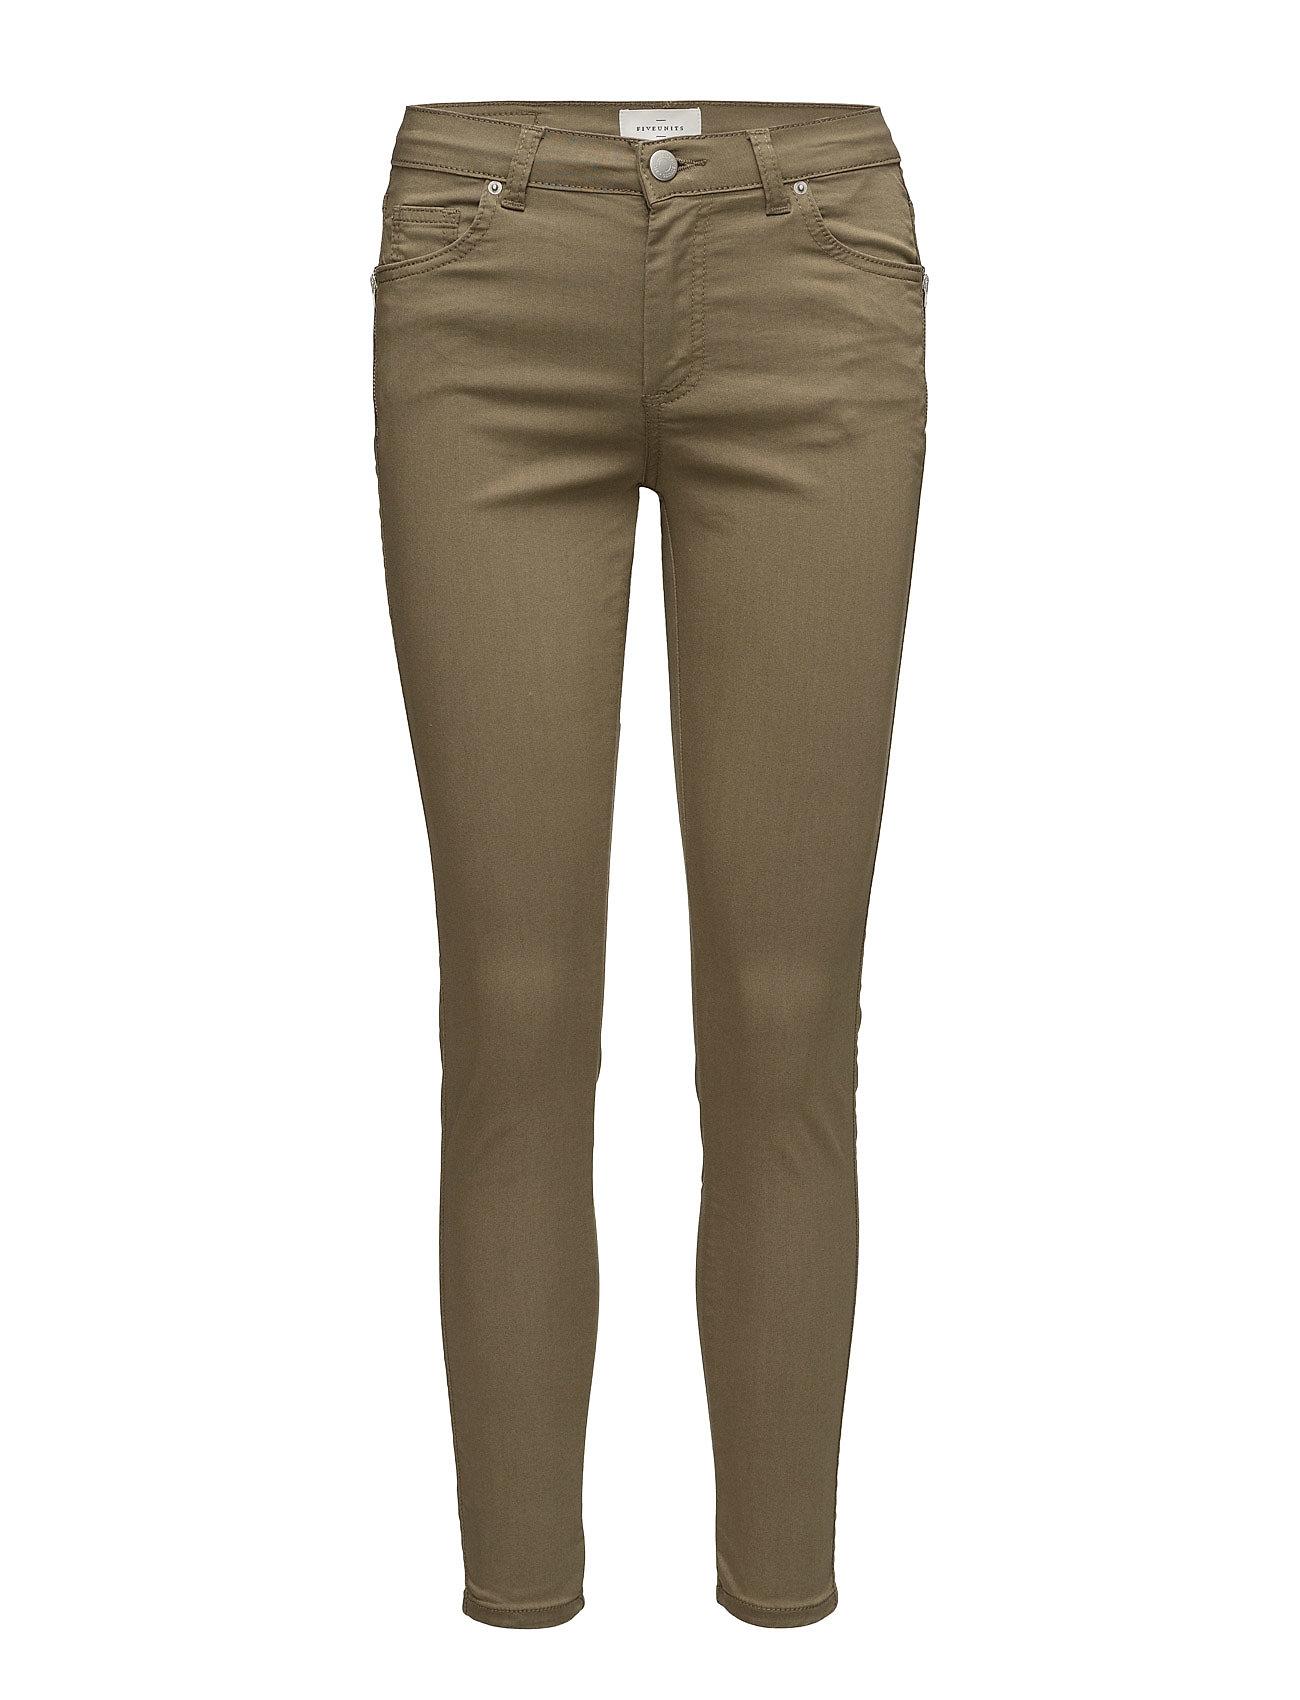 Penelope 266 Zip, Safari Line, Jeans thumbnail